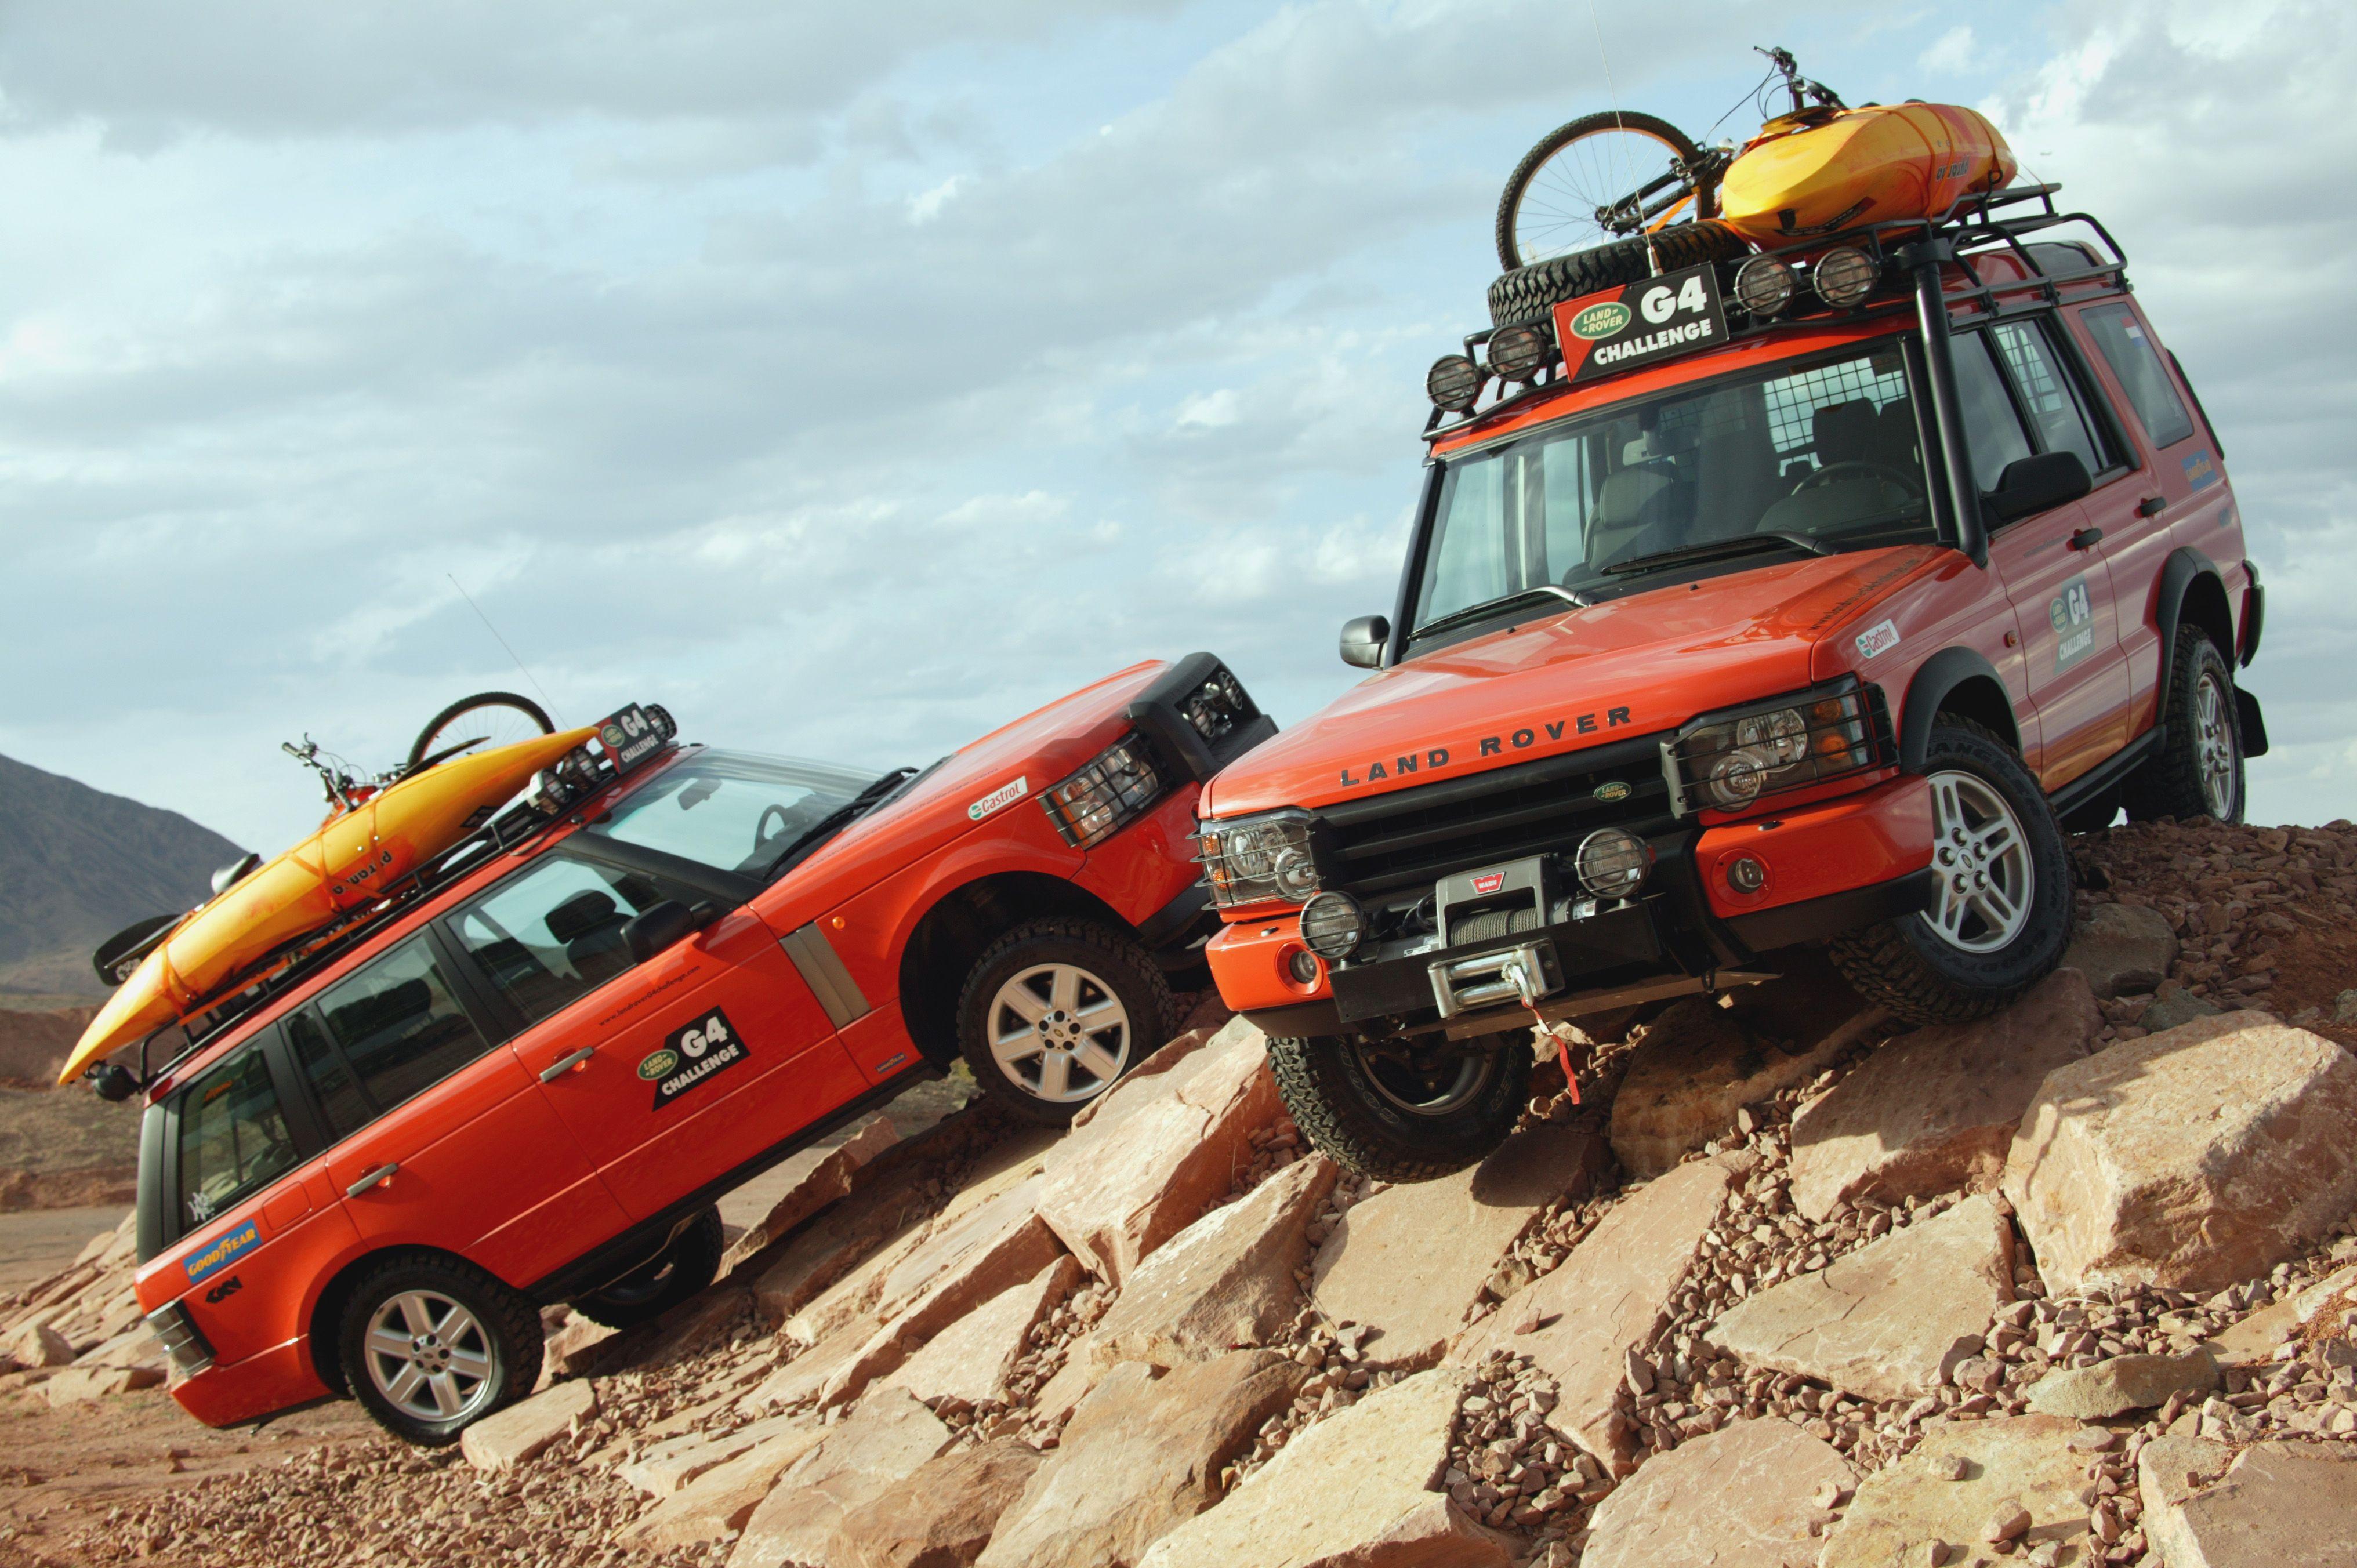 G4 Challenge Series. Love the Range Rover! Land rover